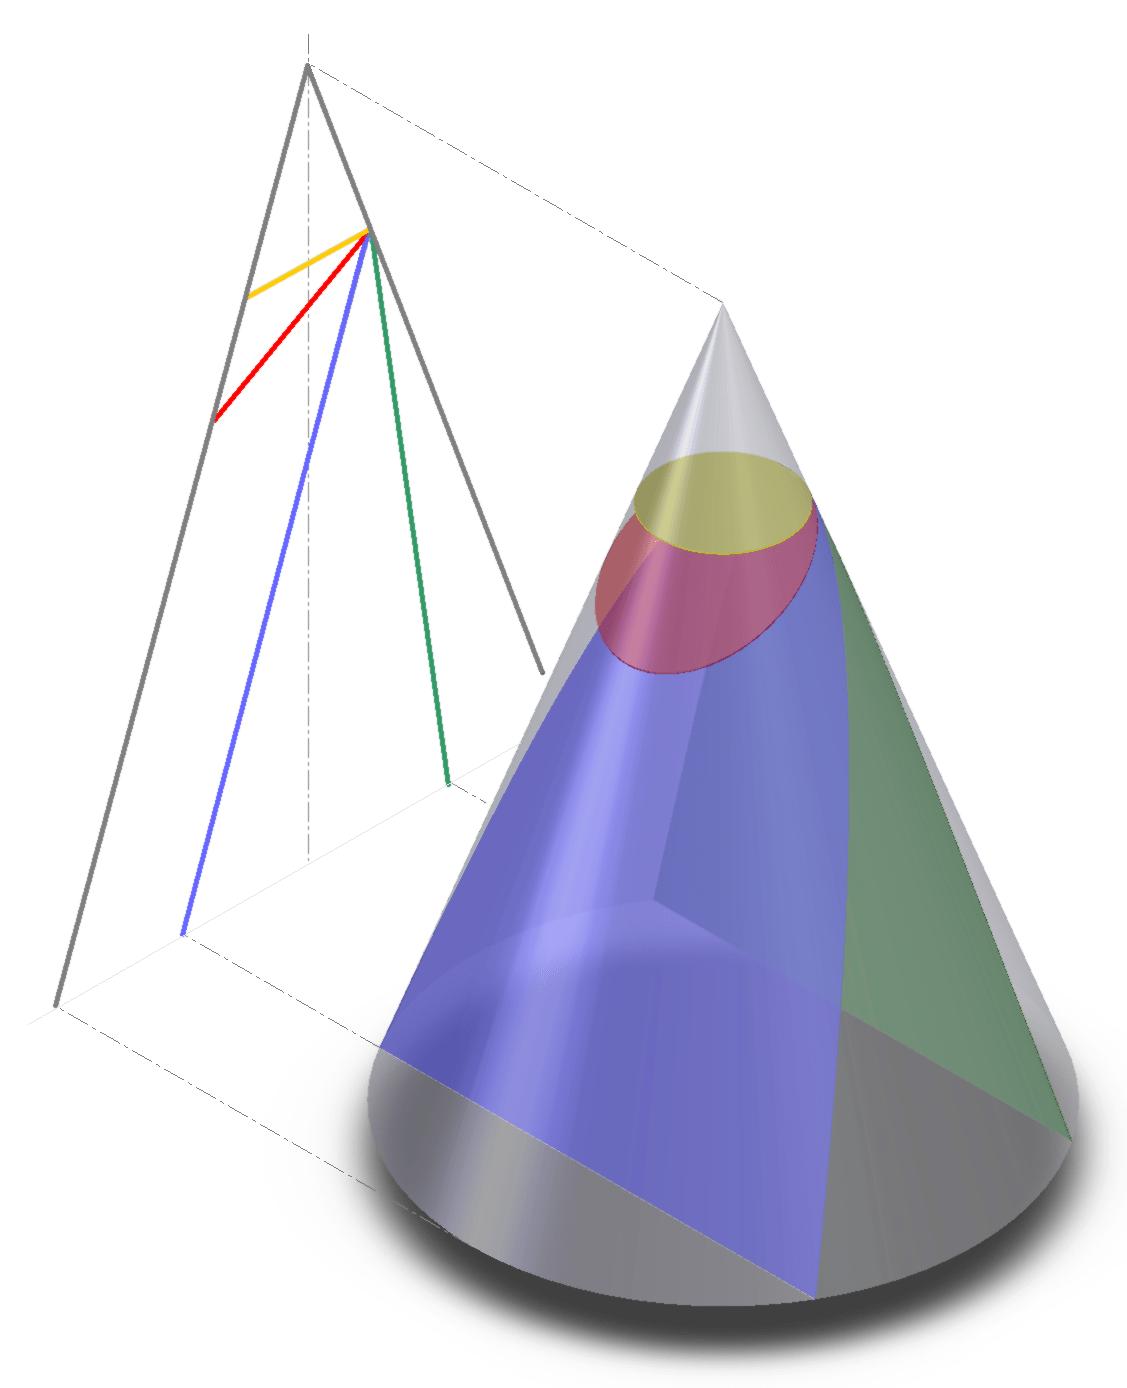 conic sections diagram word problems using venn diagrams online sat act prep blog by prepscholar math